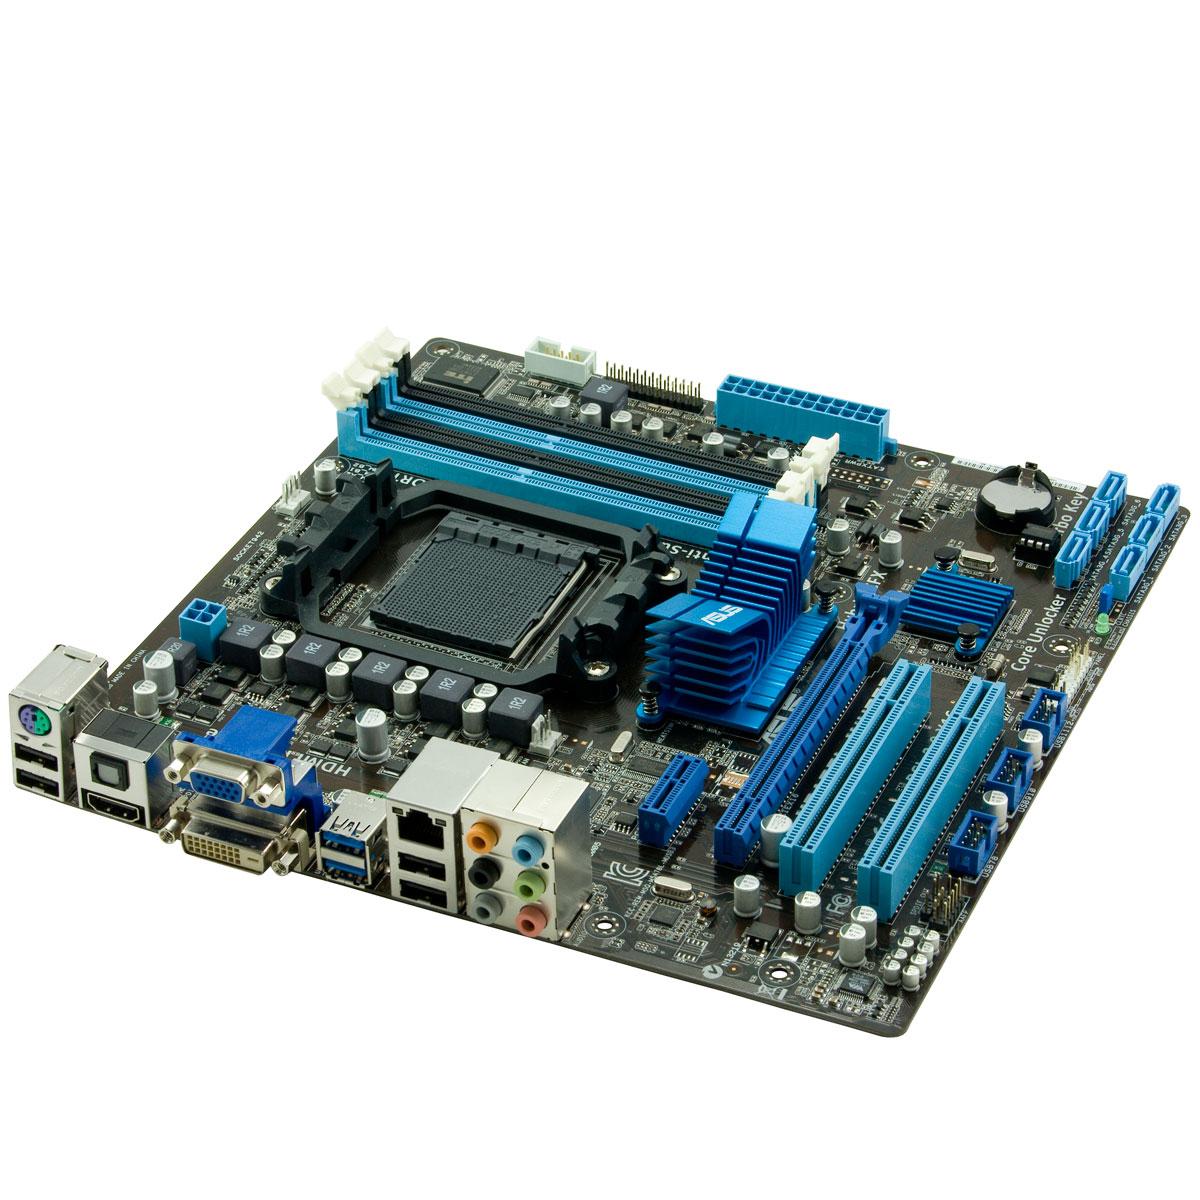 Carte mère ASUS M5A78L-M/USB3 Carte mère Micro ATX Socket AM3+ AMD 760G - SATA 3 Gbps - USB 3.0